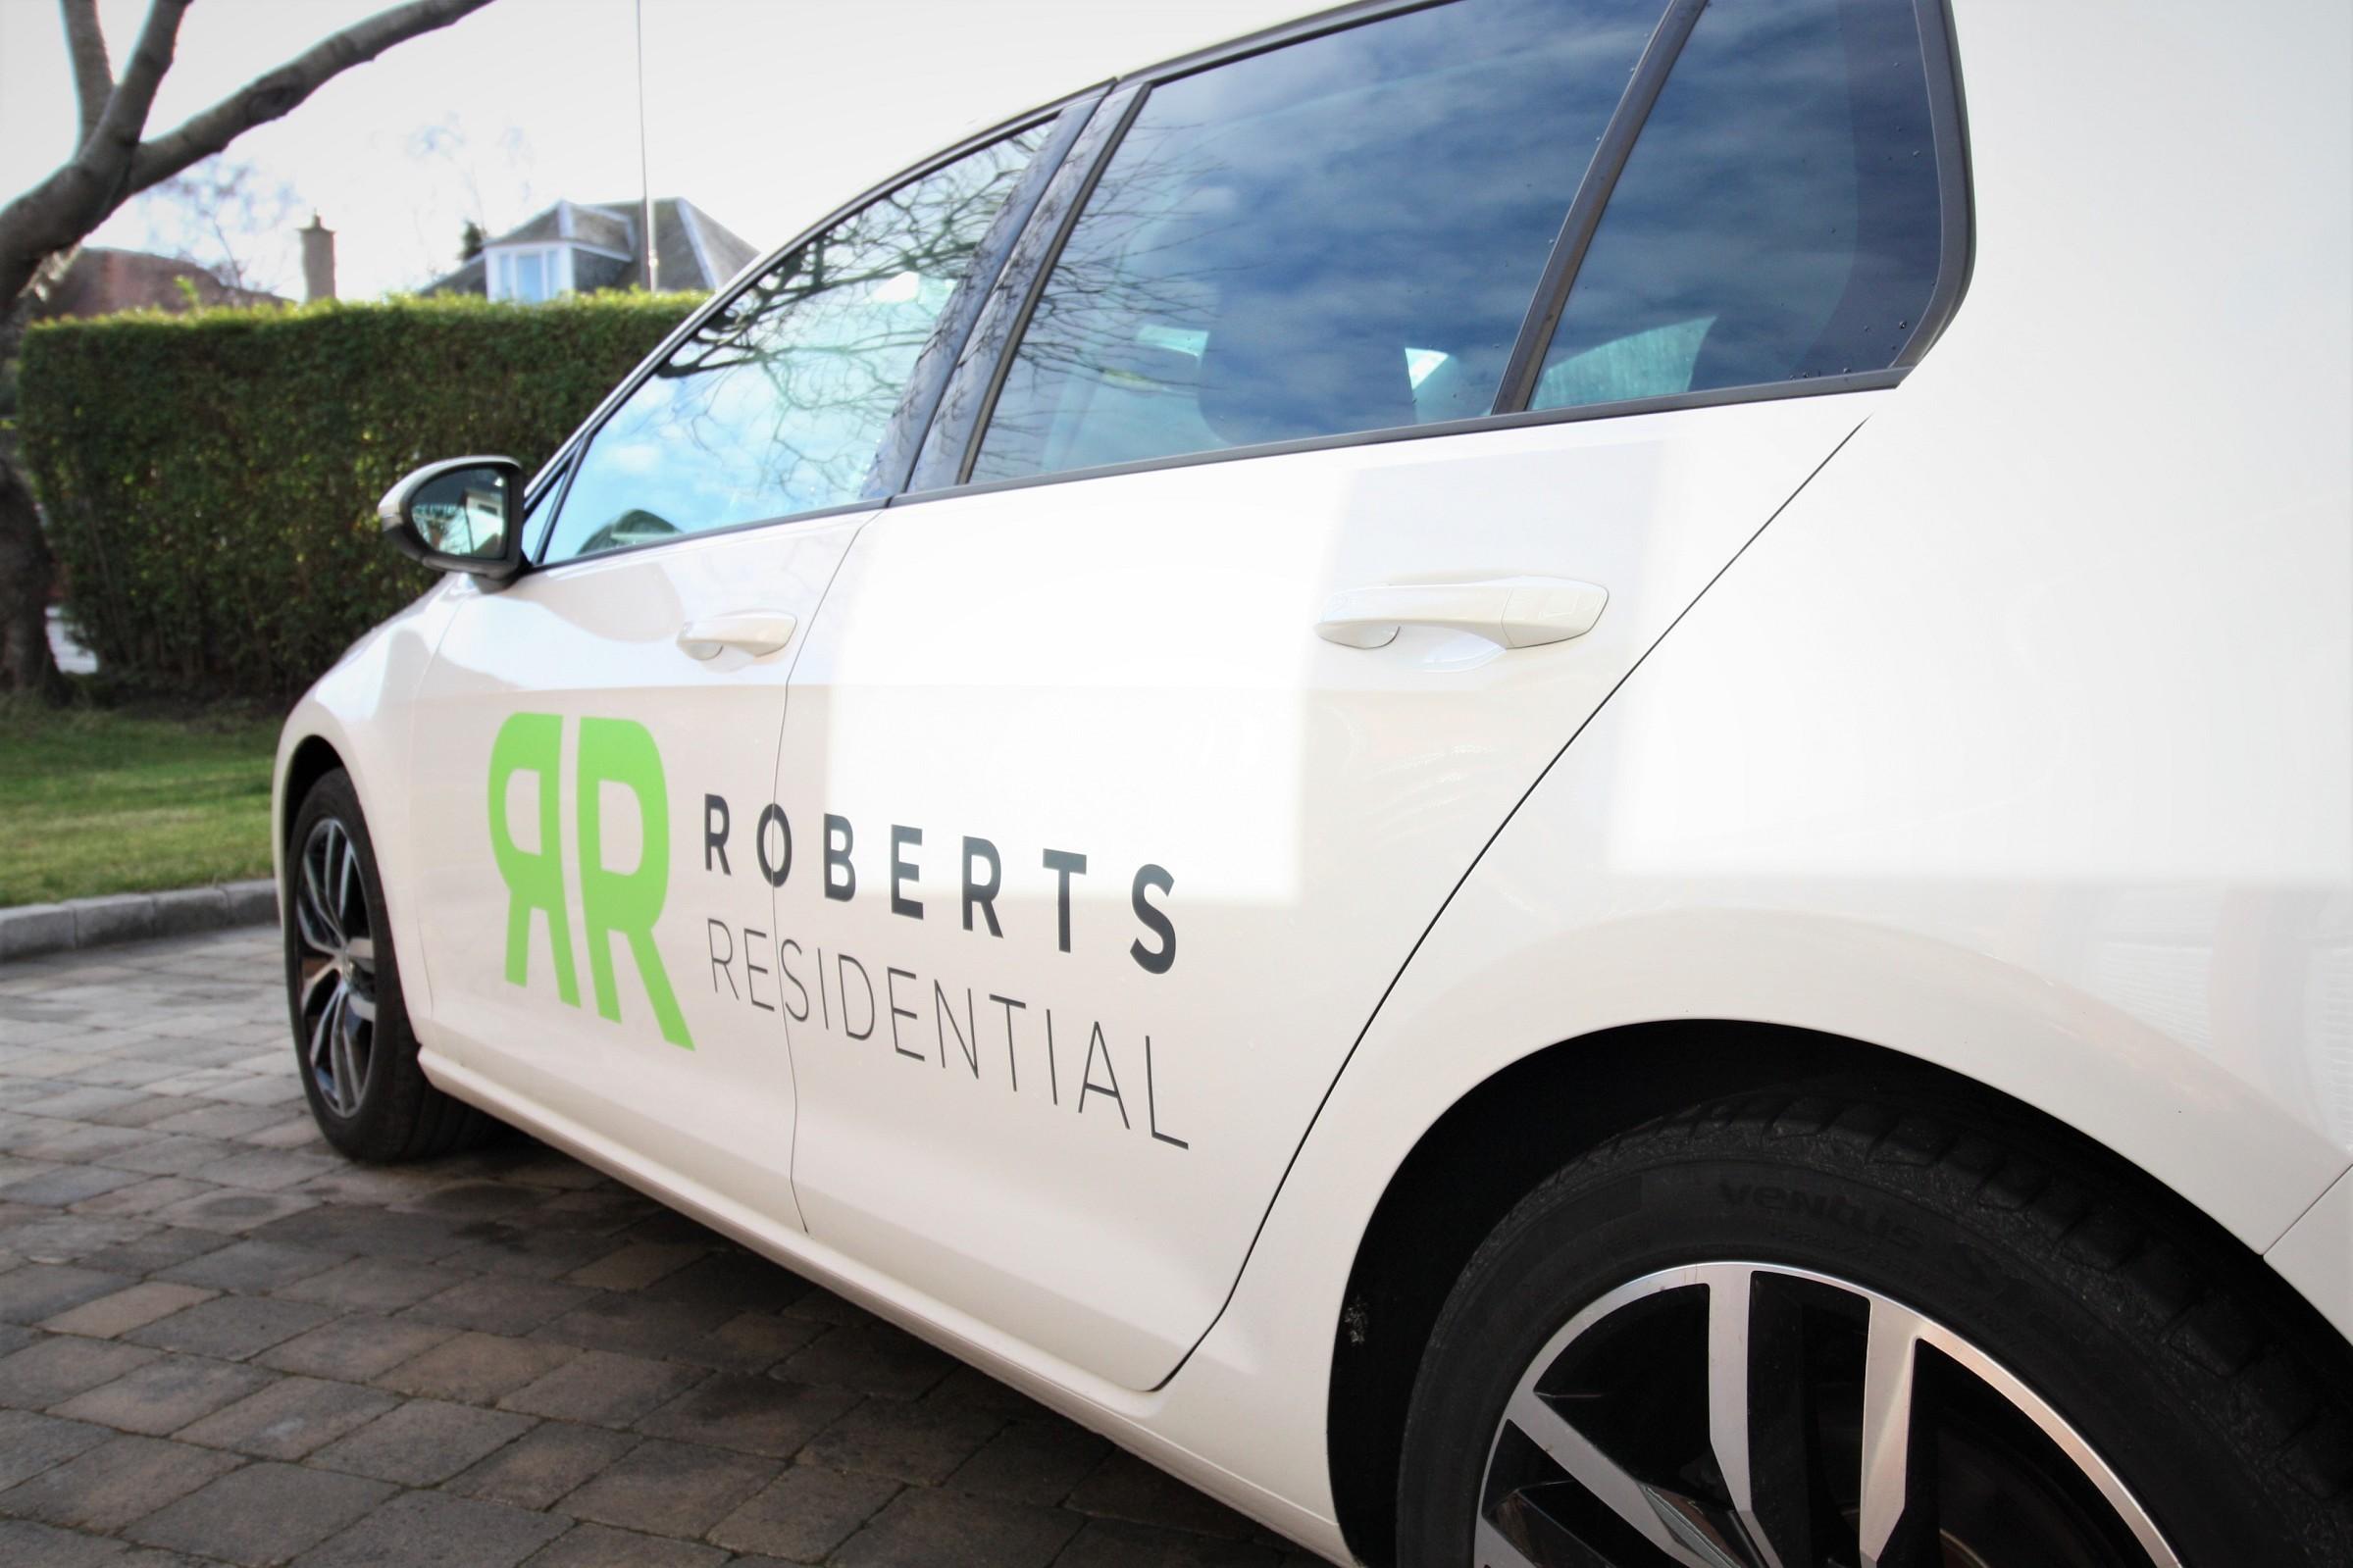 Robertson Residential Lettings Car